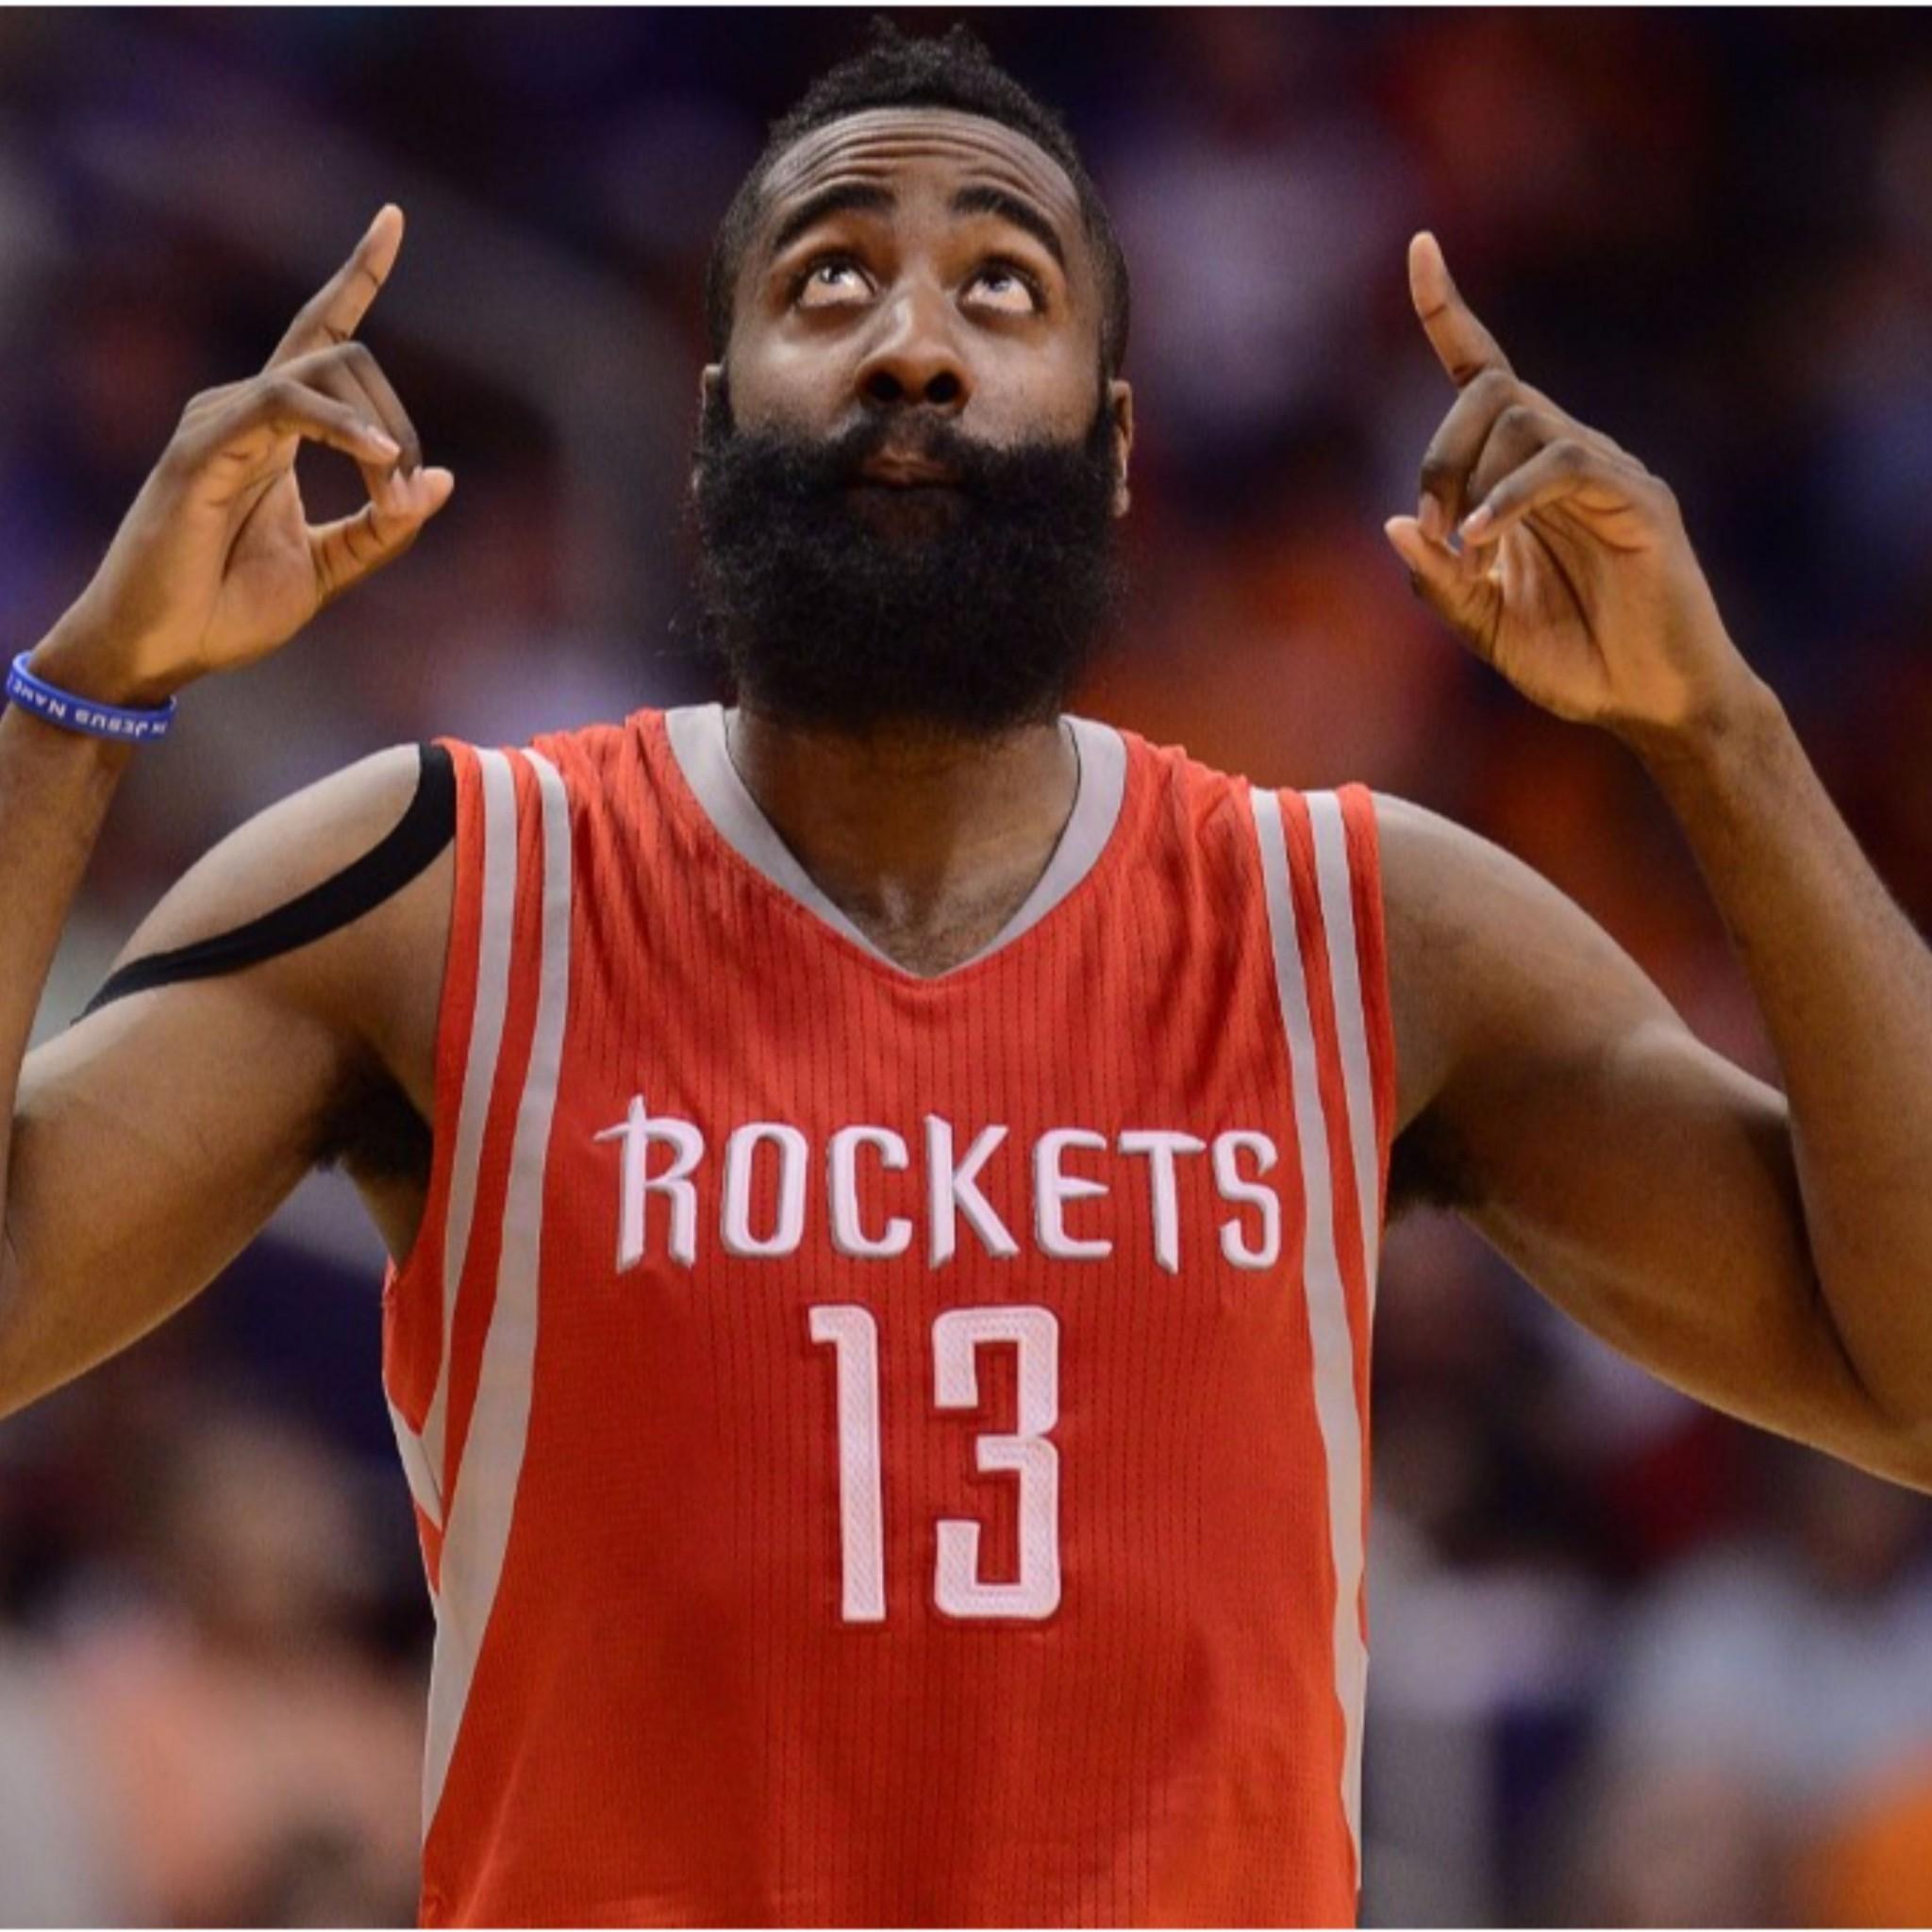 Related to Houston Rockets #13 James Harden 4K Wallpaper